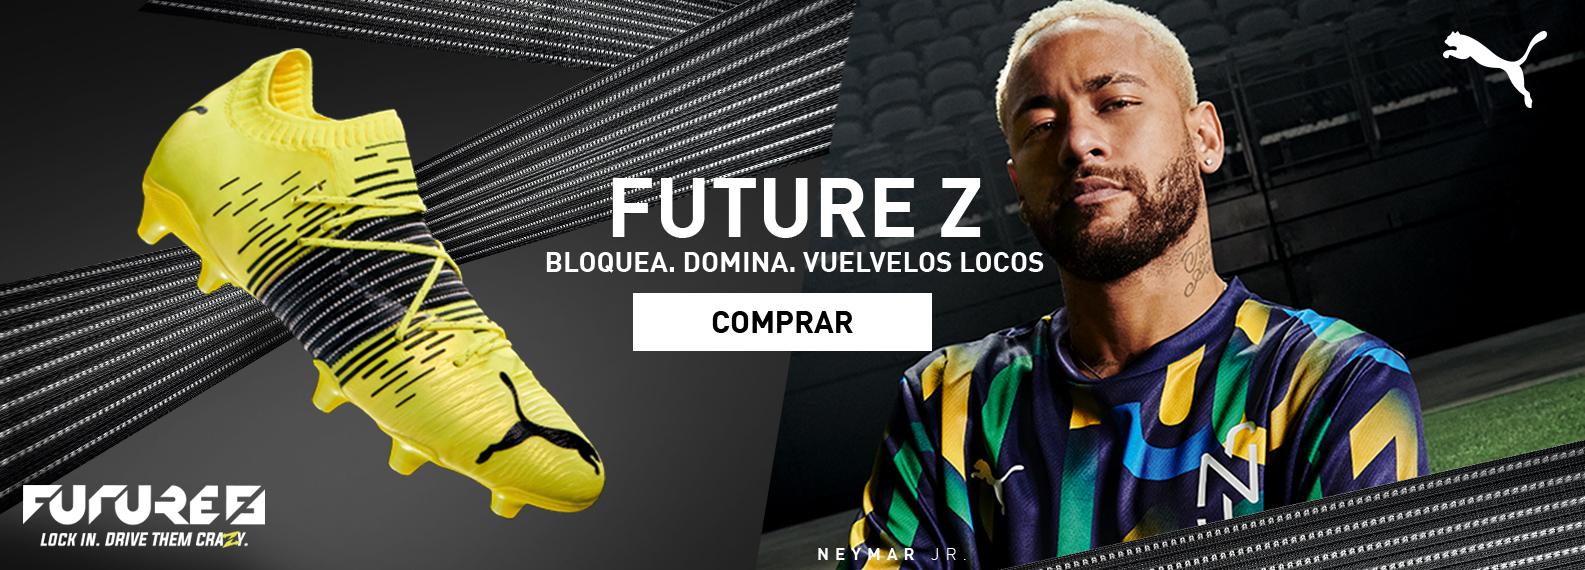 Puma FutureZ